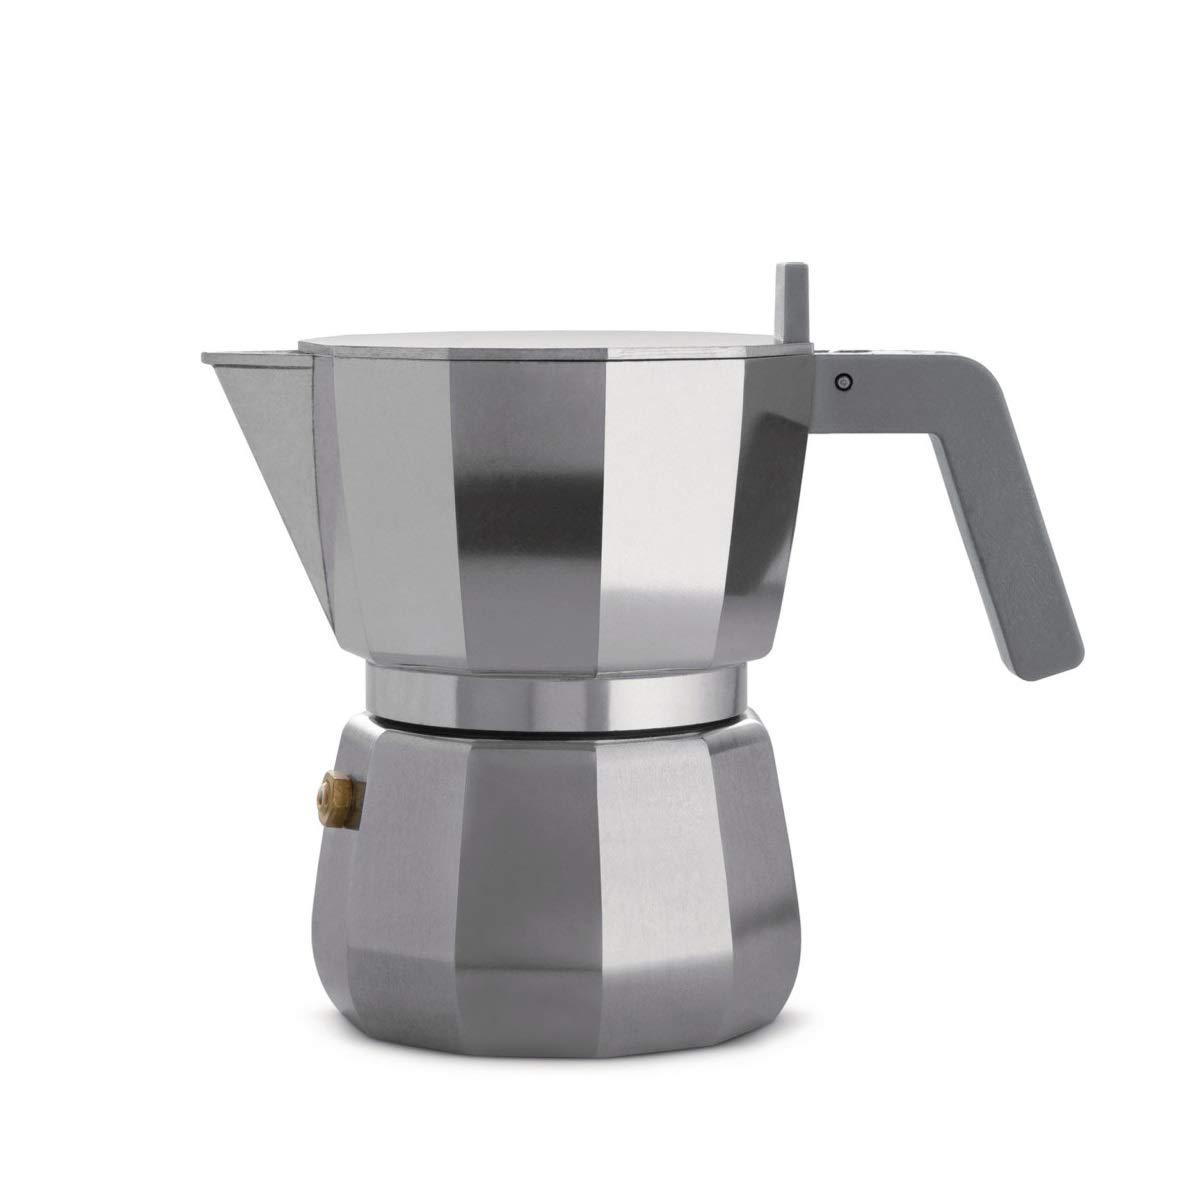 Alessi Espresso Coffee Maker in Aluminium Casting. Handle and knob in PA, Grey. 3 Cup.